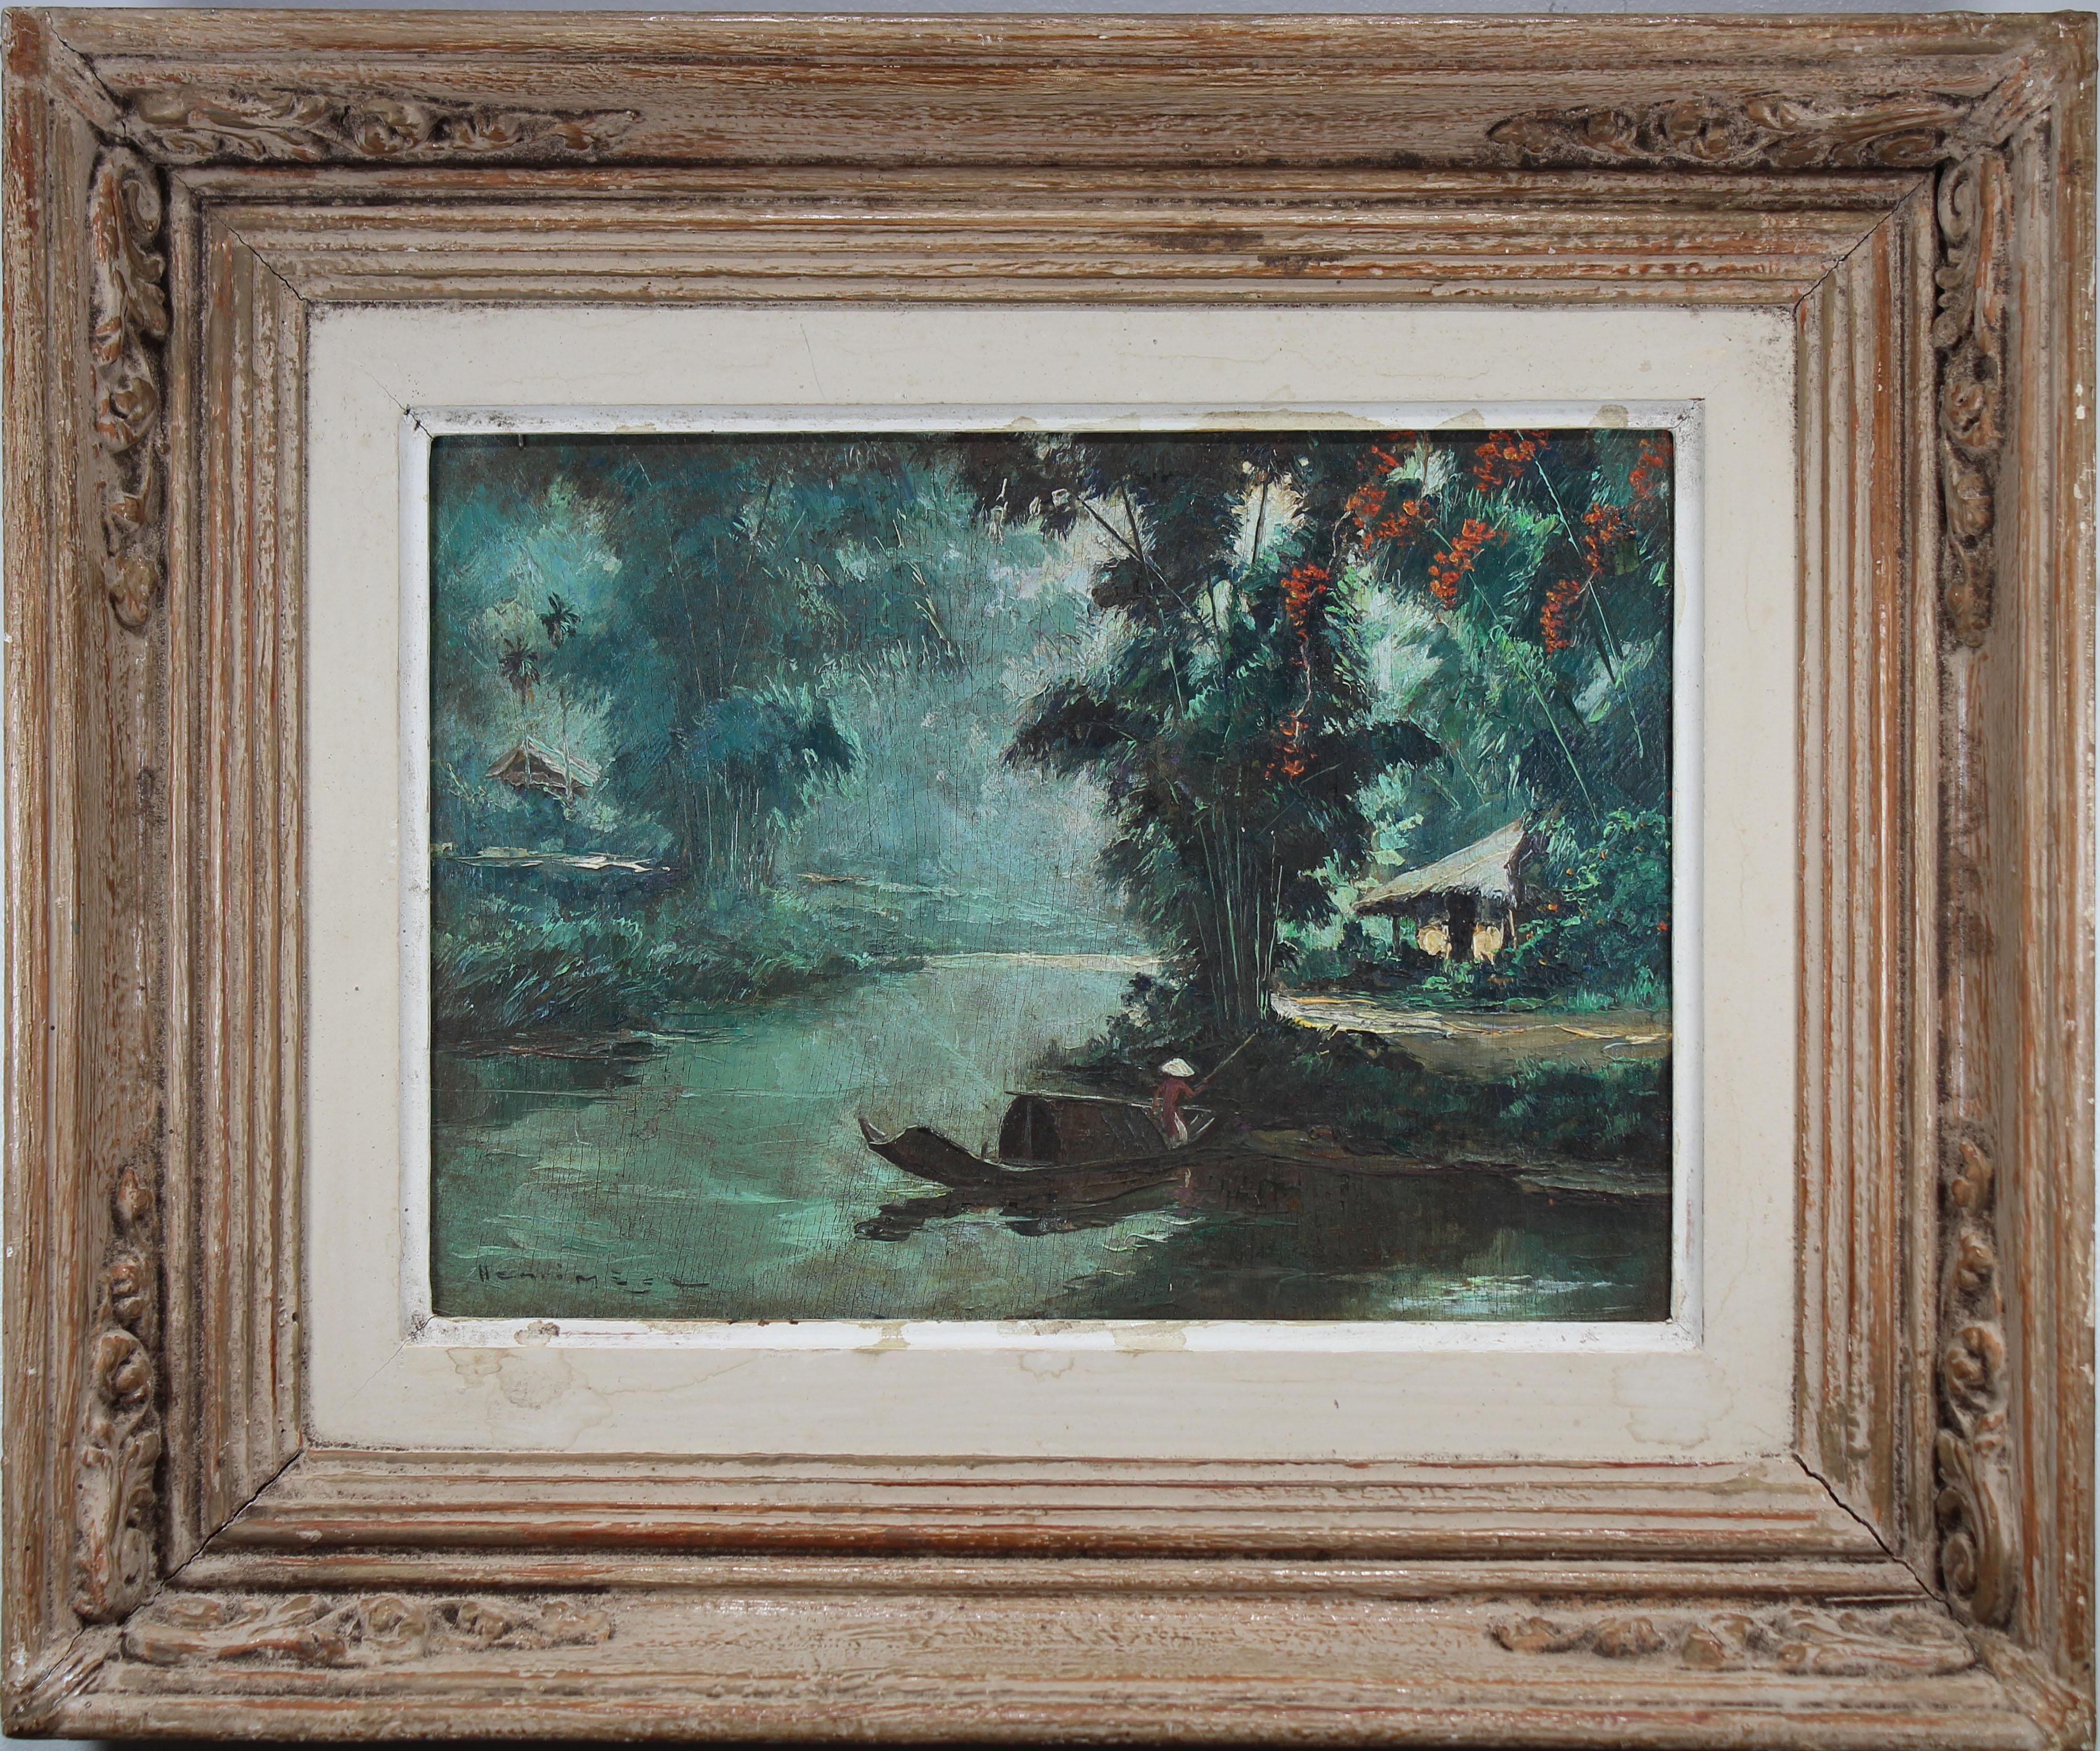 Lot 43 - Henri Mege (France, Viet Nam, 1904/09 - 1984)